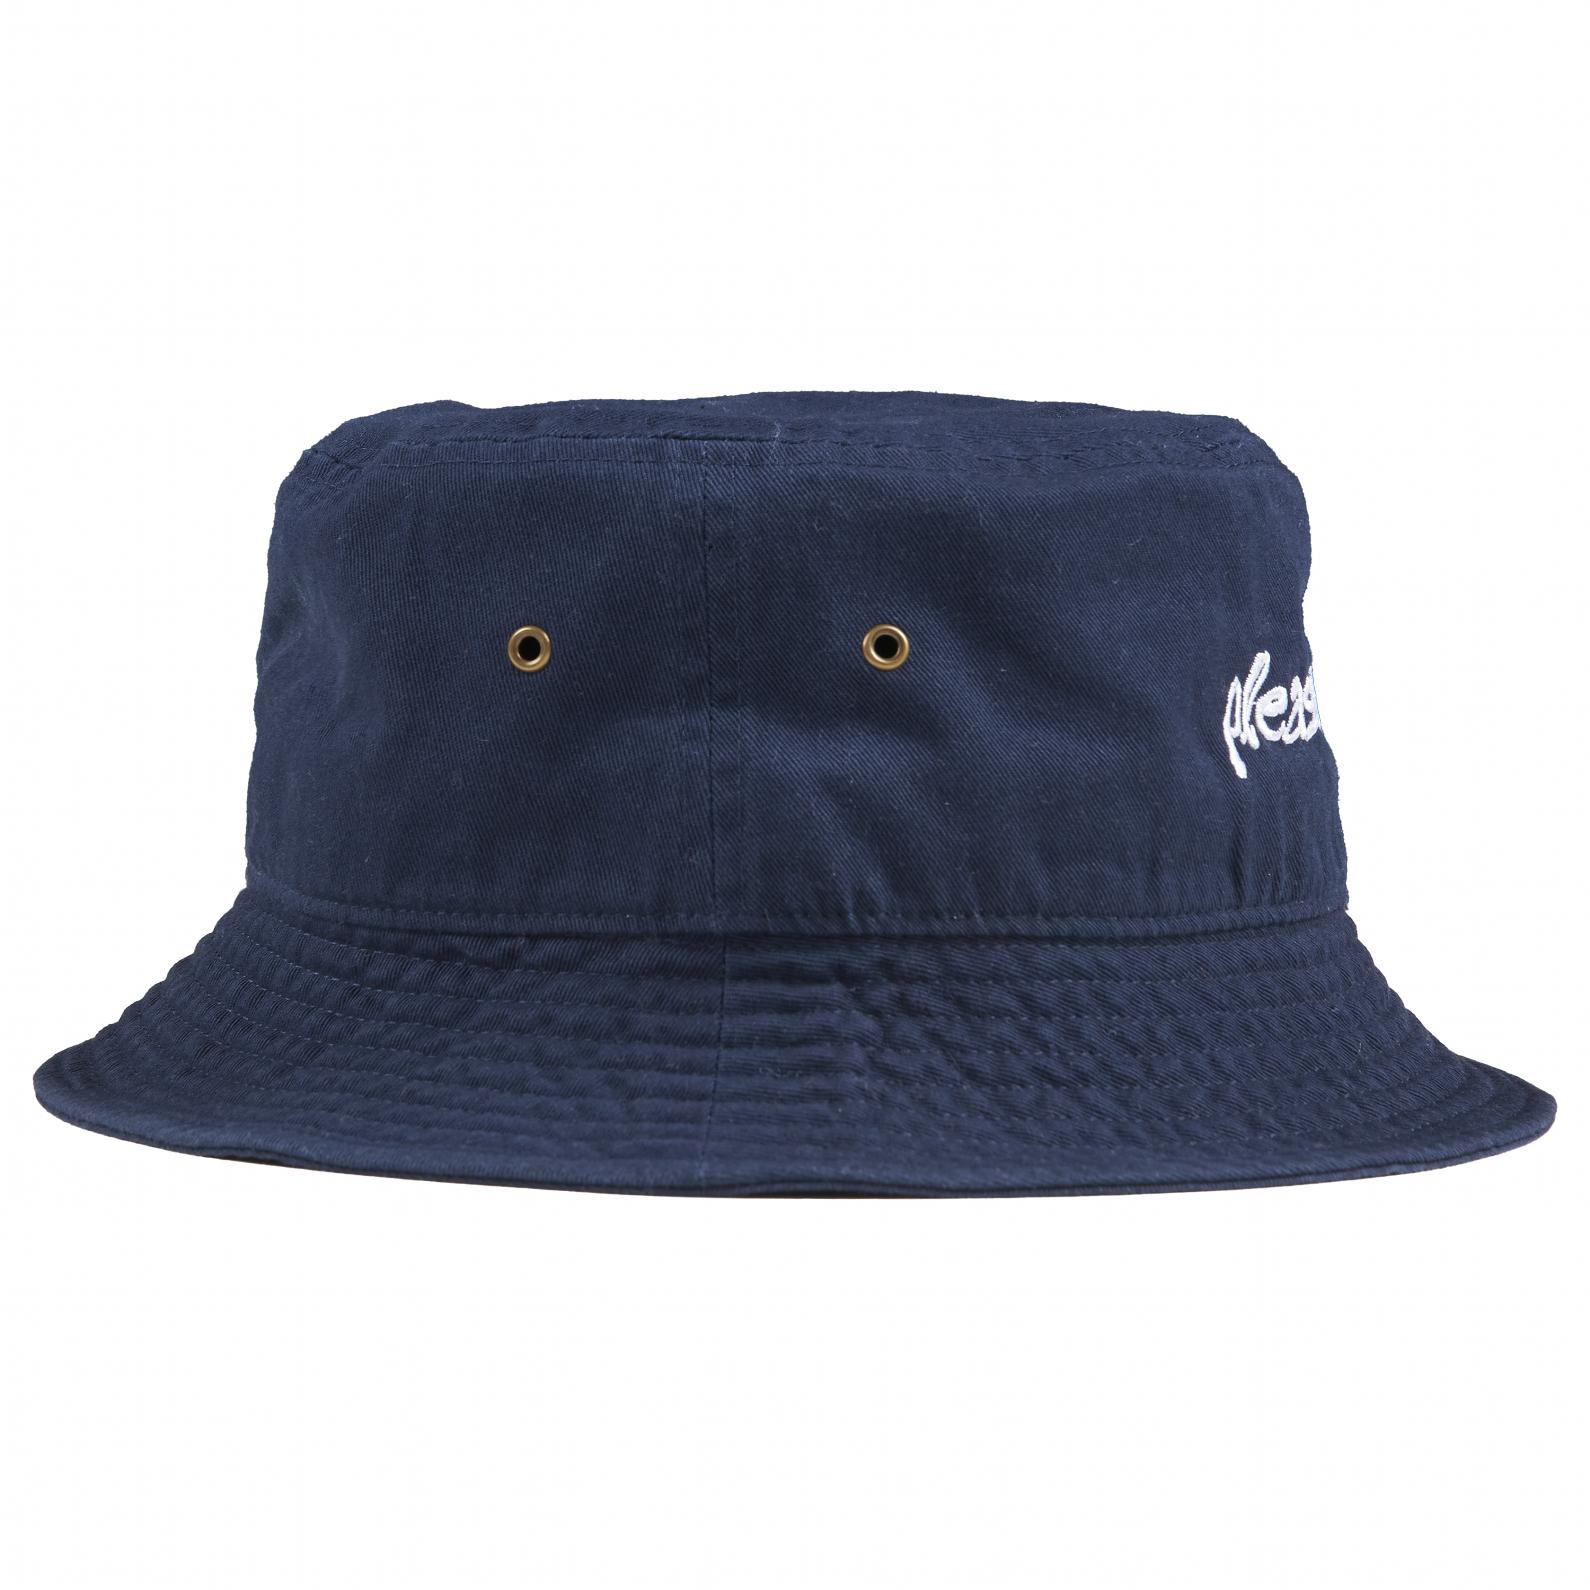 【PLEASURES/プレジャーズ】HYDE LOGO BUCKET HAT バケットハット / NAVY